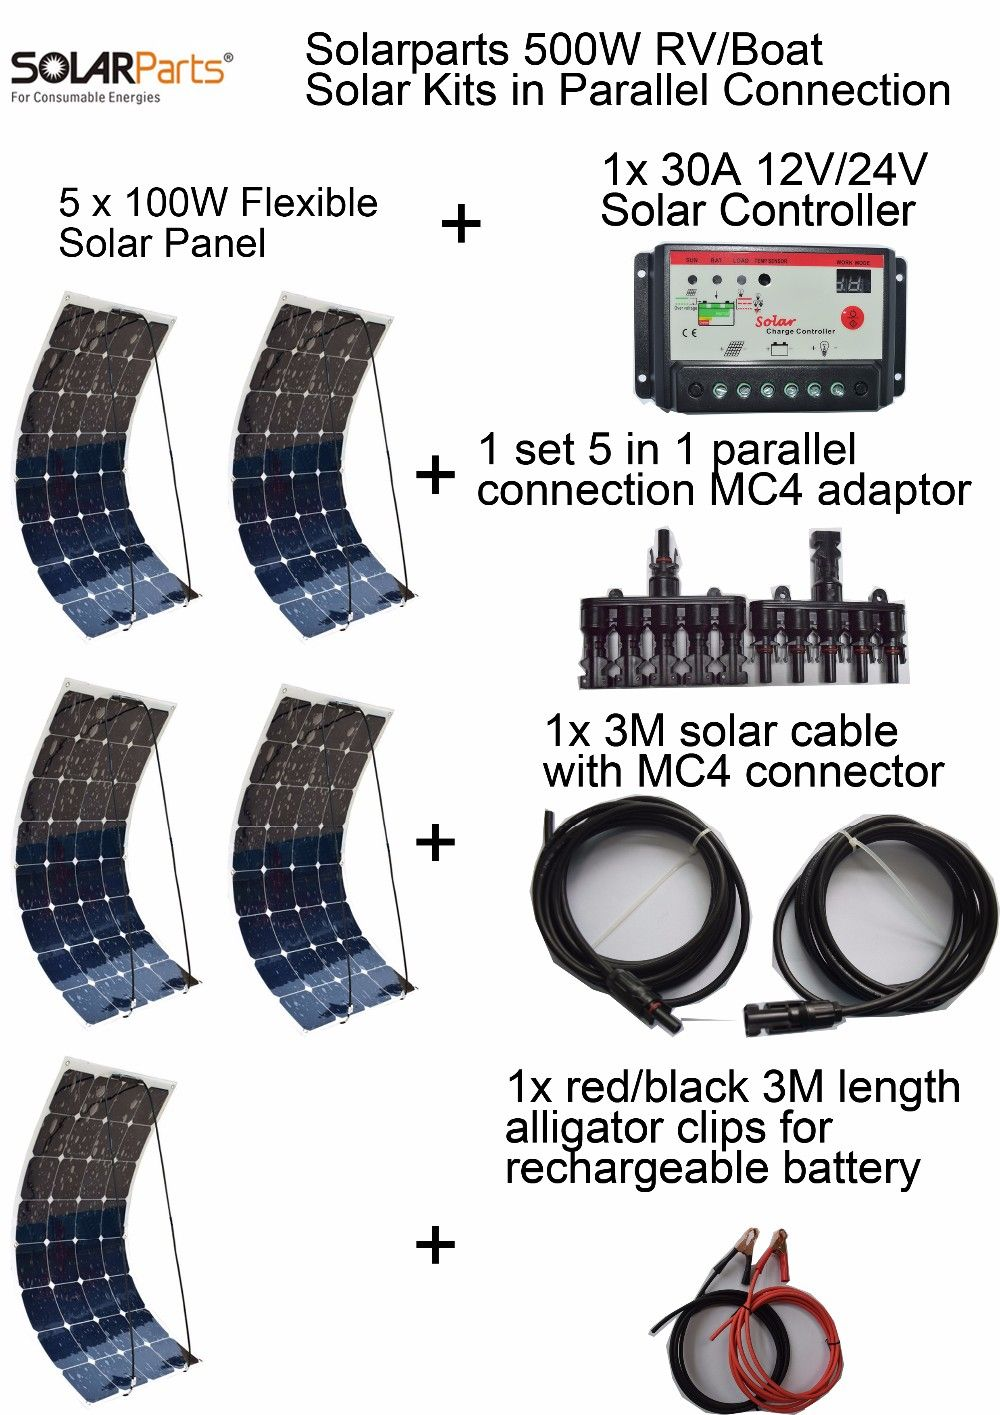 Solarparts Standard Kits 500w Diy Rv Boat Kits Solar System 100w Flexible Solar Panel Controller Cable Outdoor Lig Flexible Solar Panels Solar Kit Solar Panels